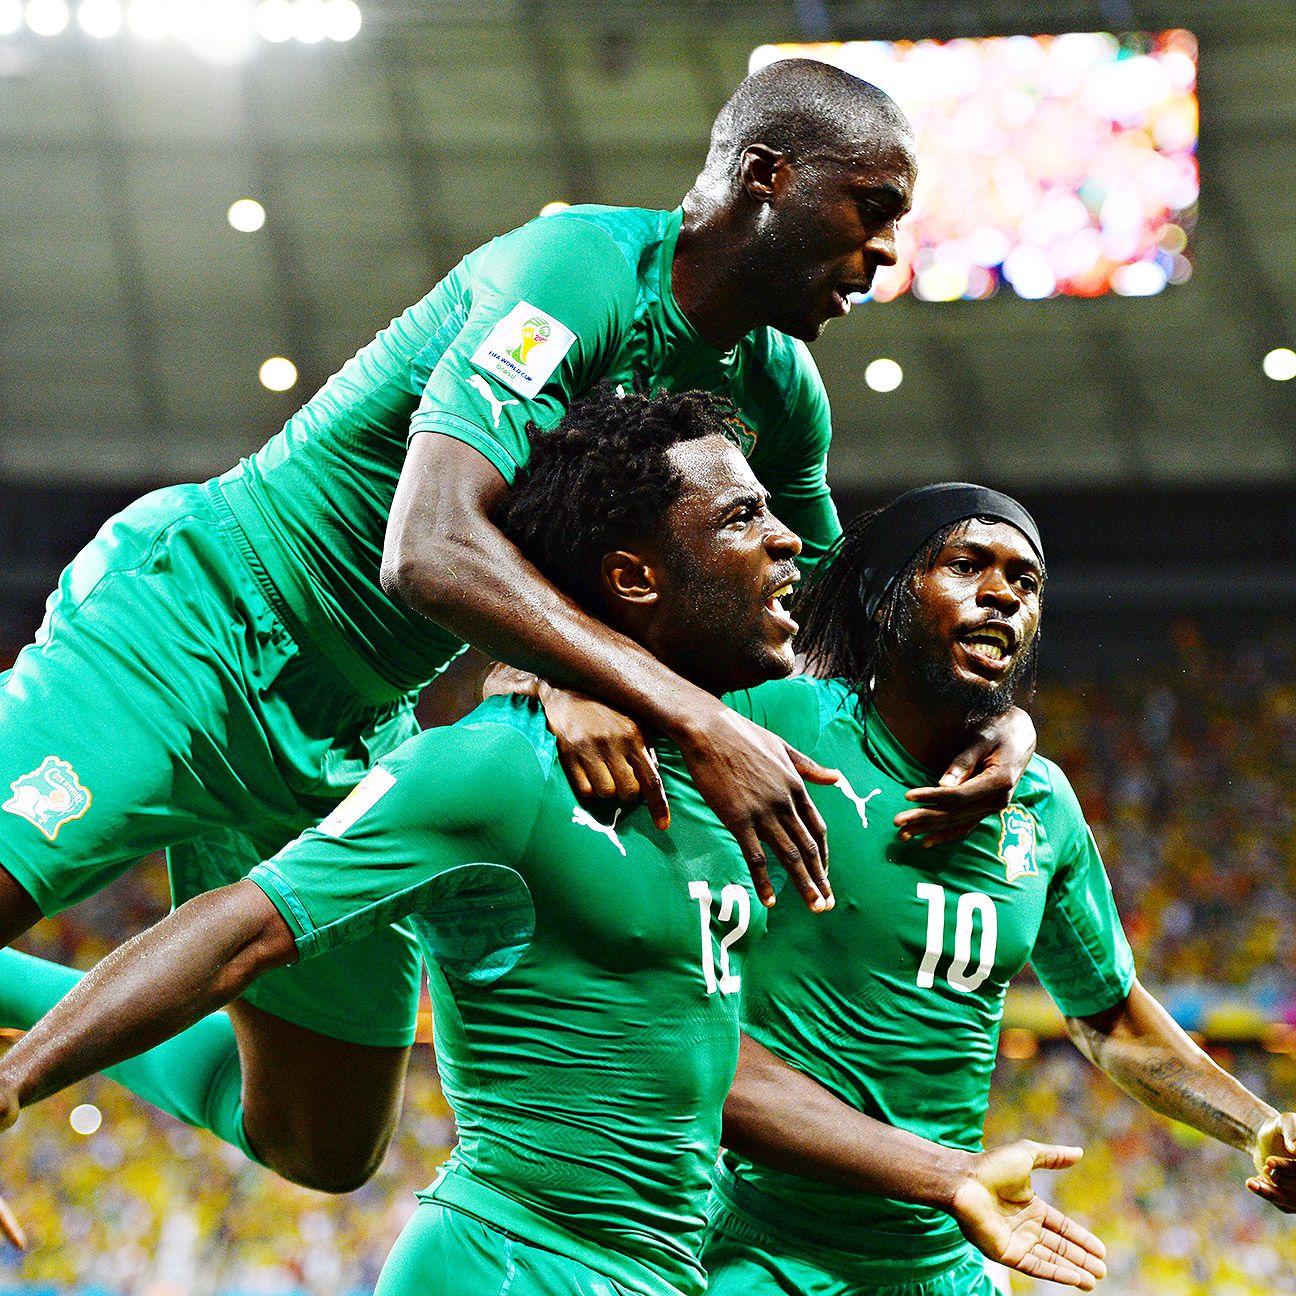 Gervinho, Yaya Toure & Wilfried Bony celebrate for the Ivory Coast